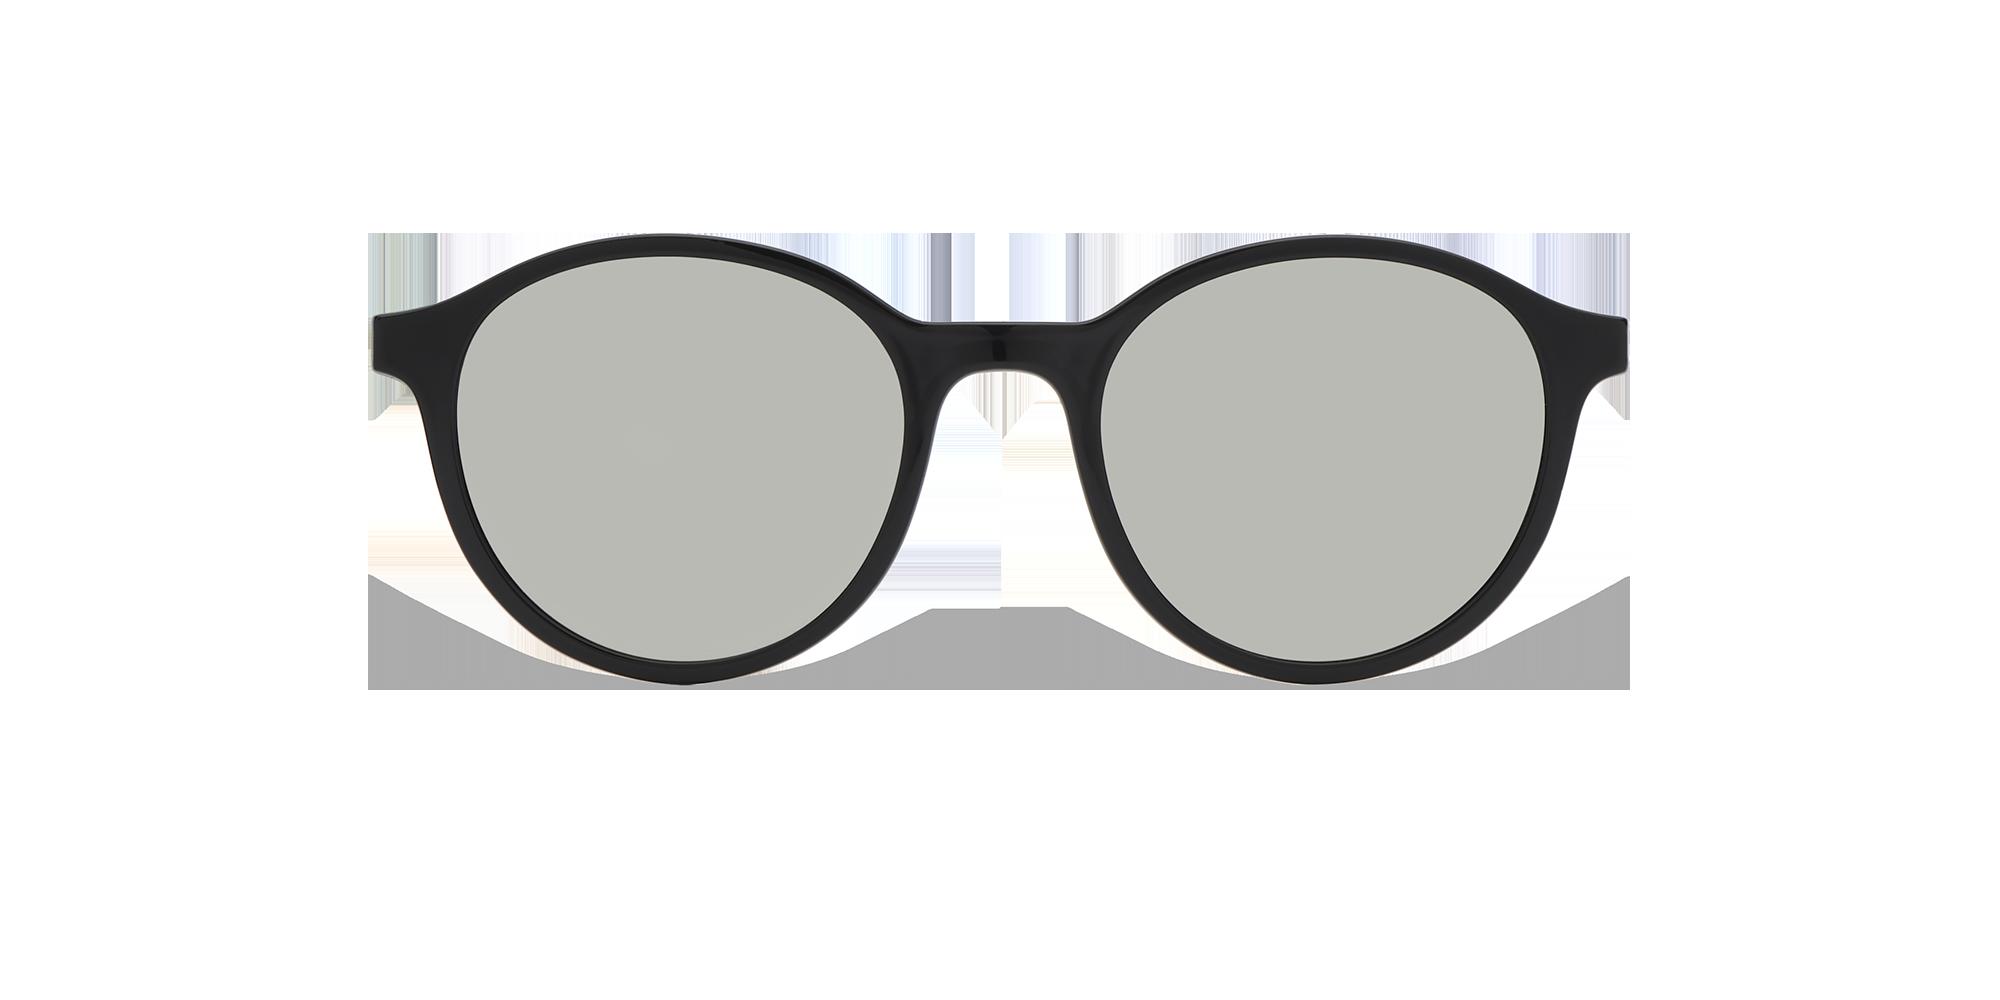 afflelou/france/products/smart_clip/clips_glasses/TMK37R3BK014919.png